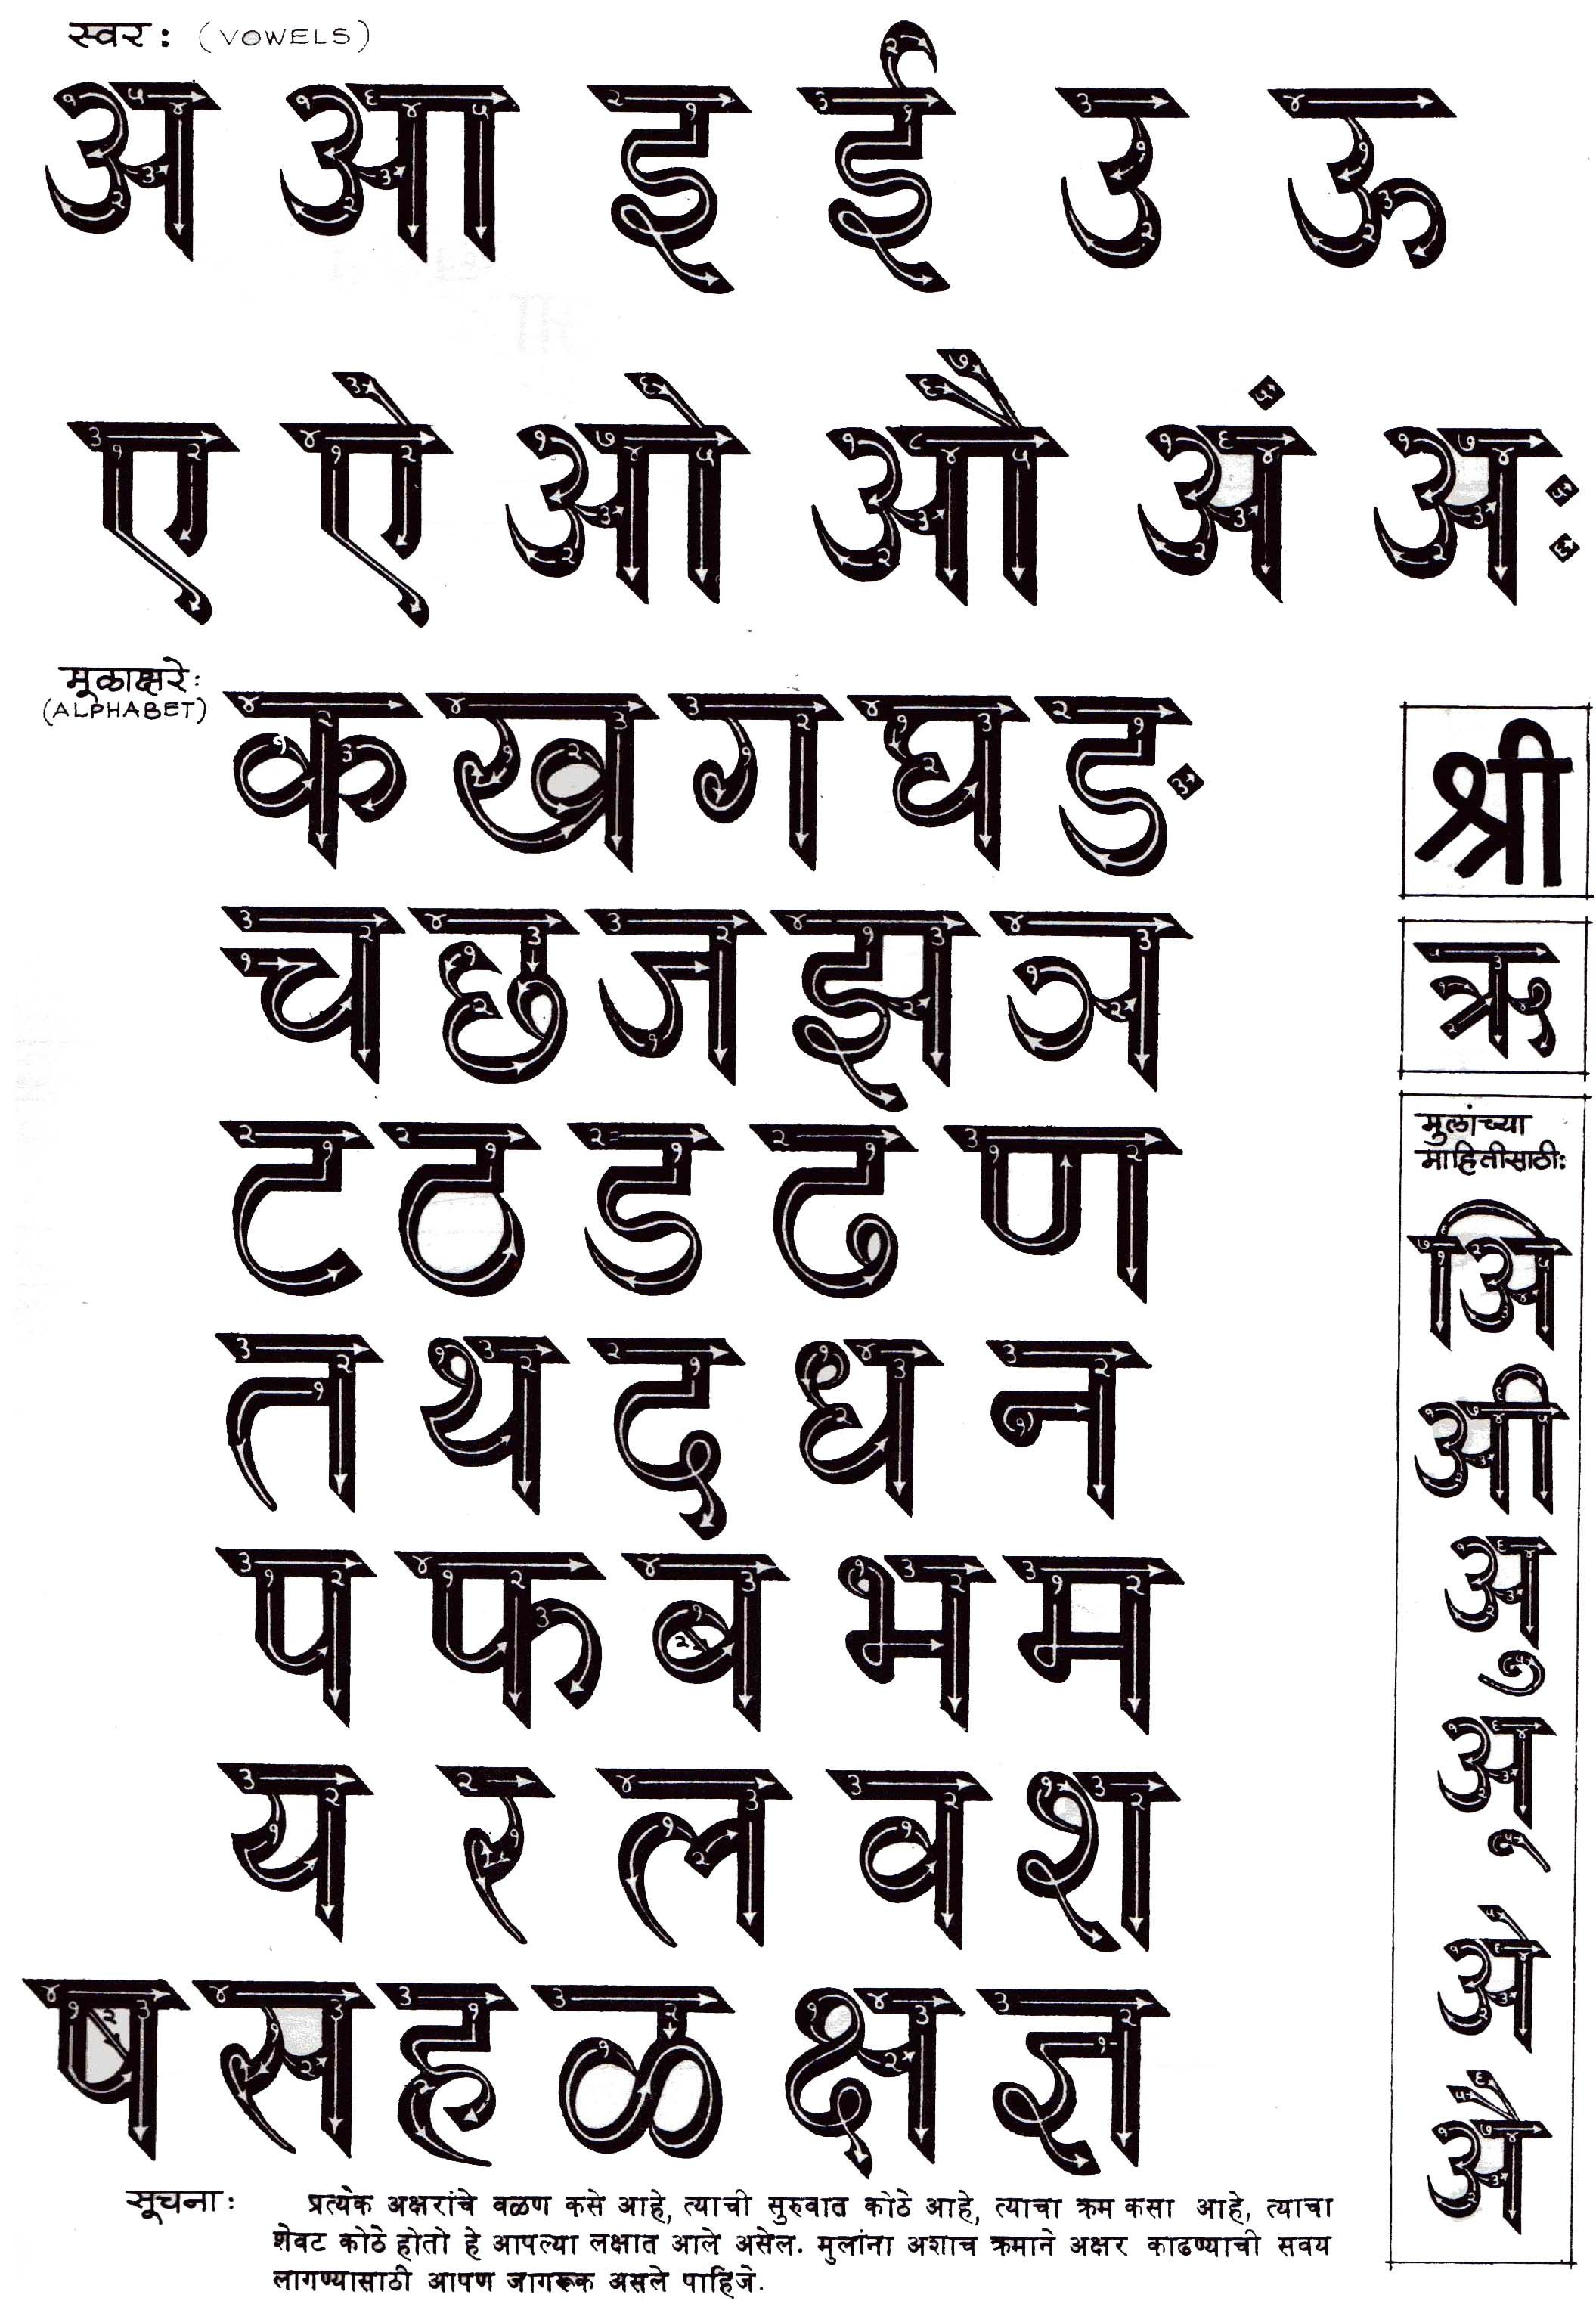 Useful Information About The Hindi Alphabet Or Devanagari